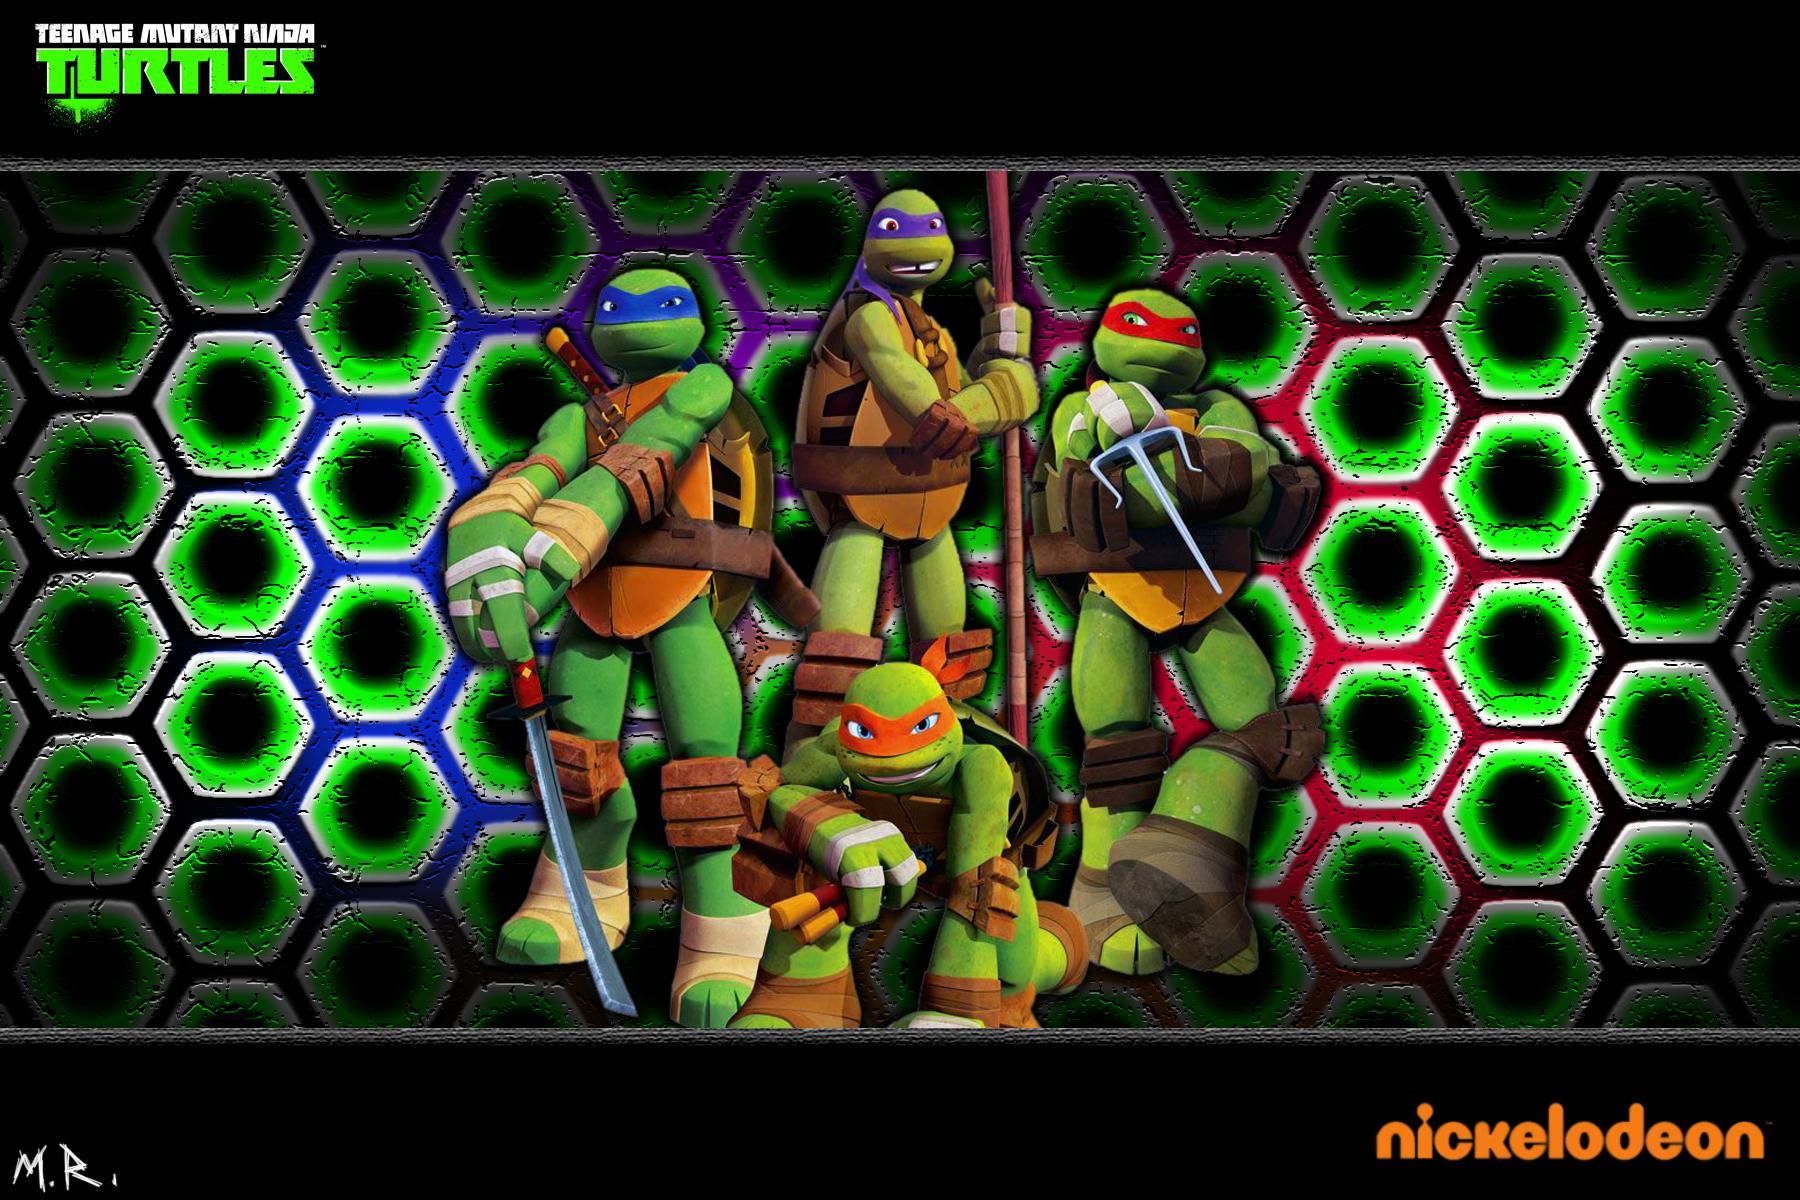 2012 Nickelodeon TMNT Wallpaper by ShadowNinja976 on 1800x1200